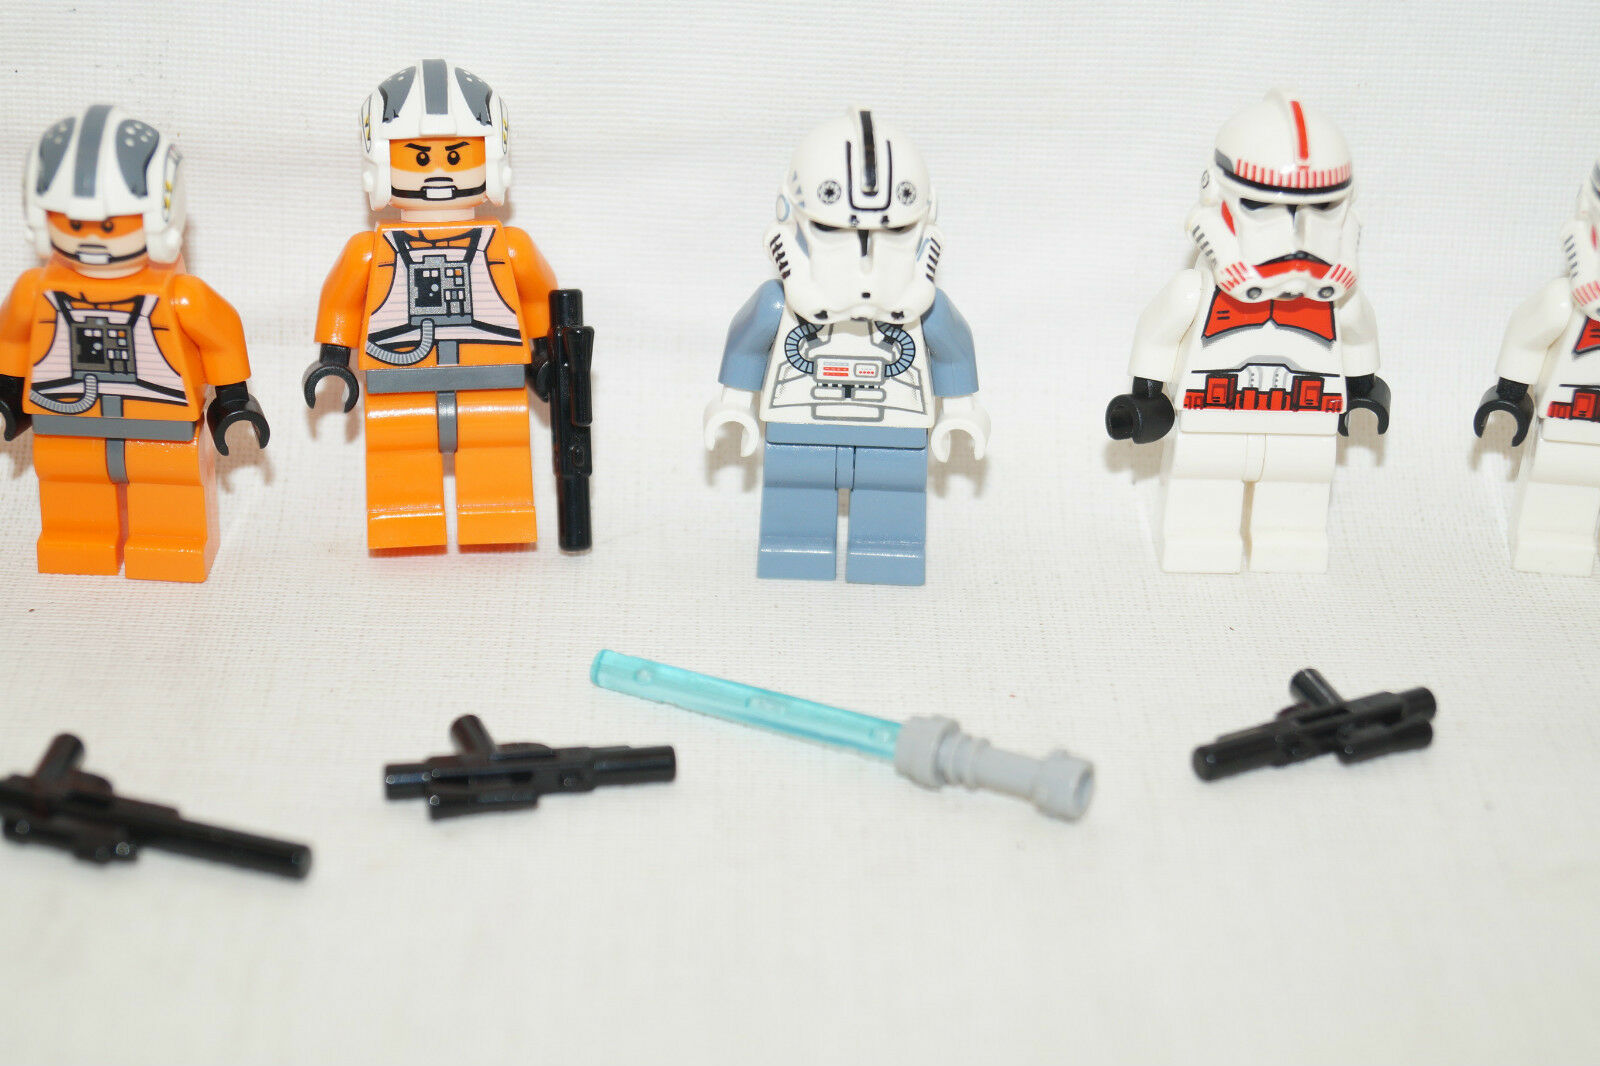 LEGO Star Wars 8 8 8 Piloten Rebel Clone Pilot 9de7c4